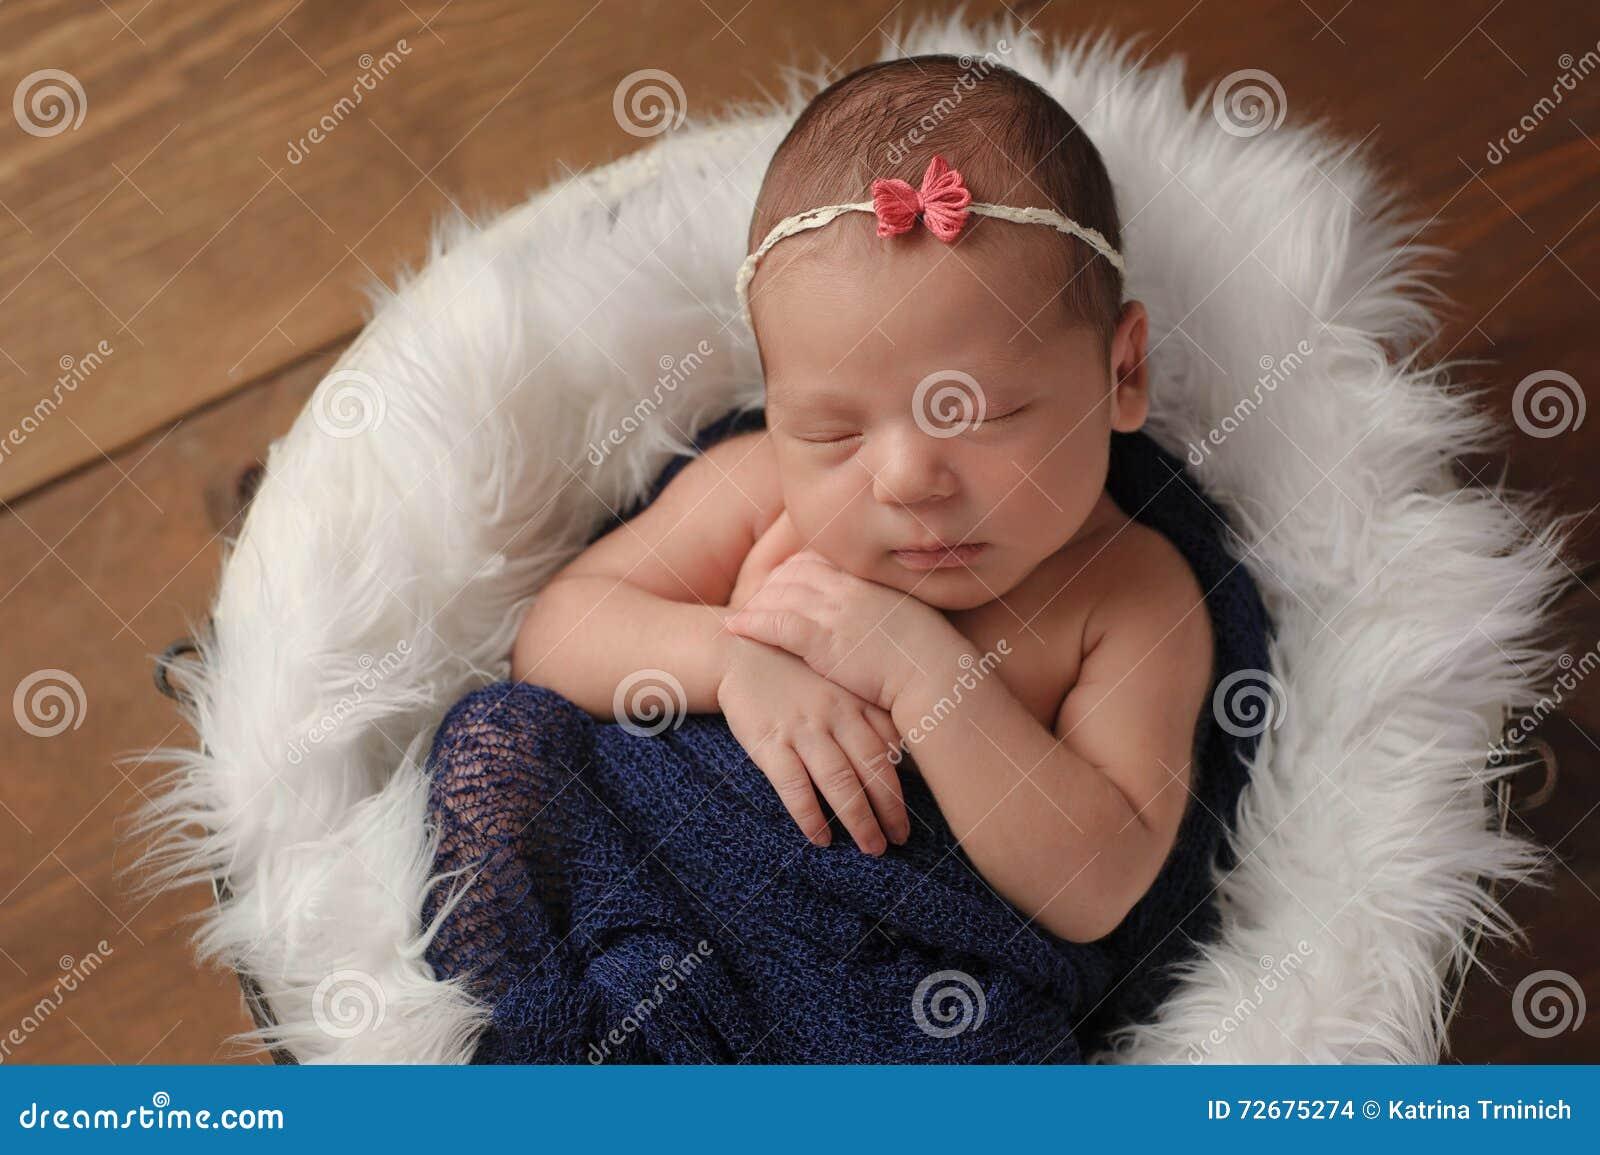 Newborn Baby Girl Sleeping in Fur Lined Bucket